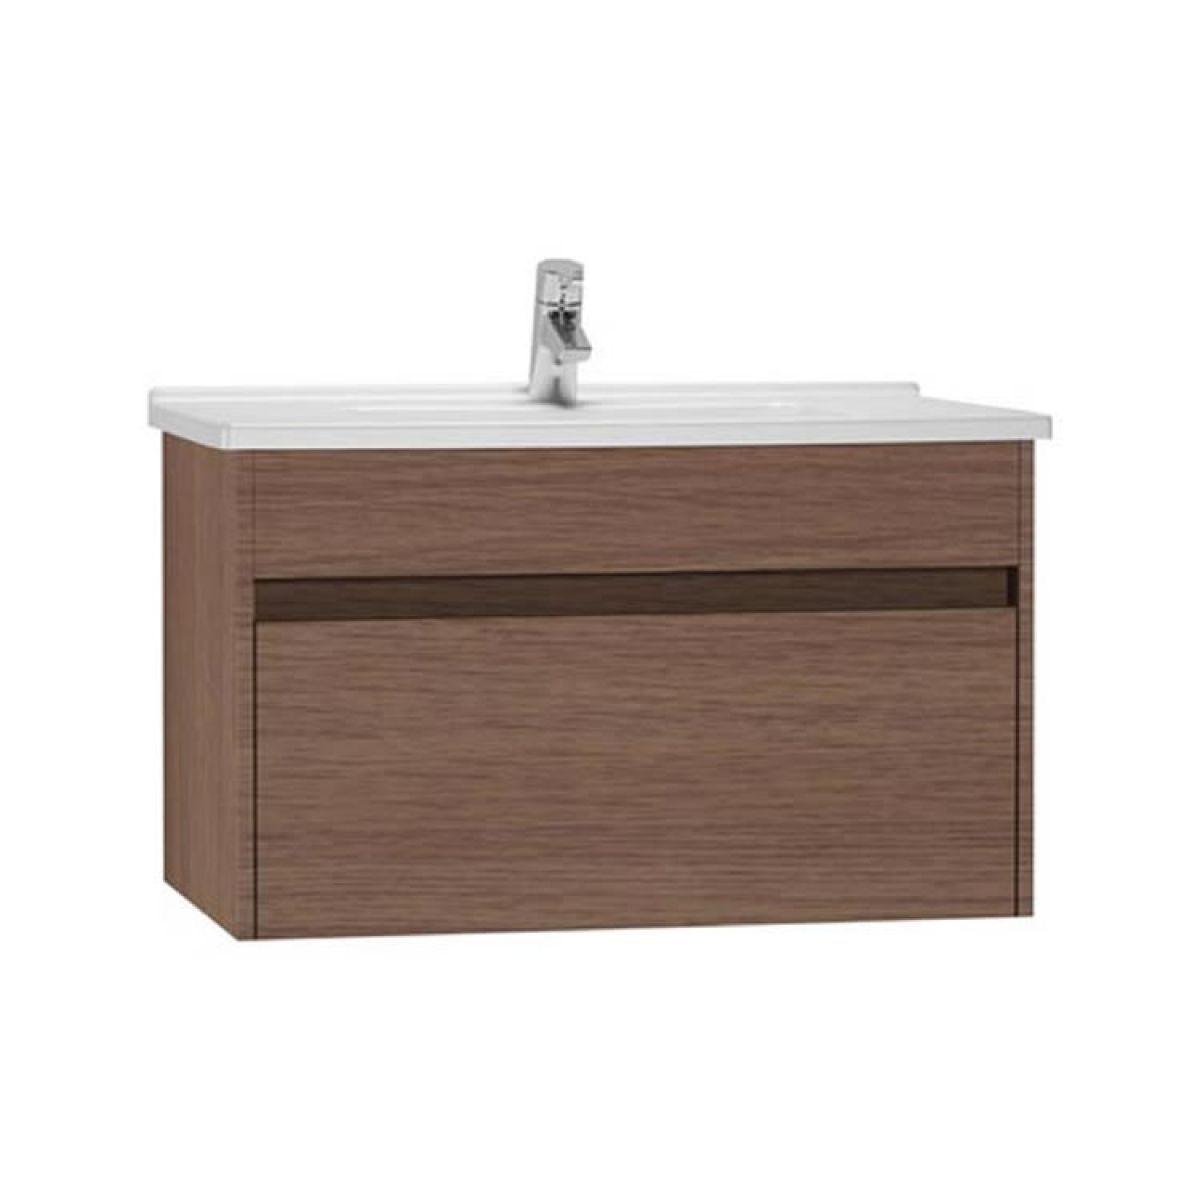 Vitra S50 Vanity Unit And Basin Set Uk Bathrooms